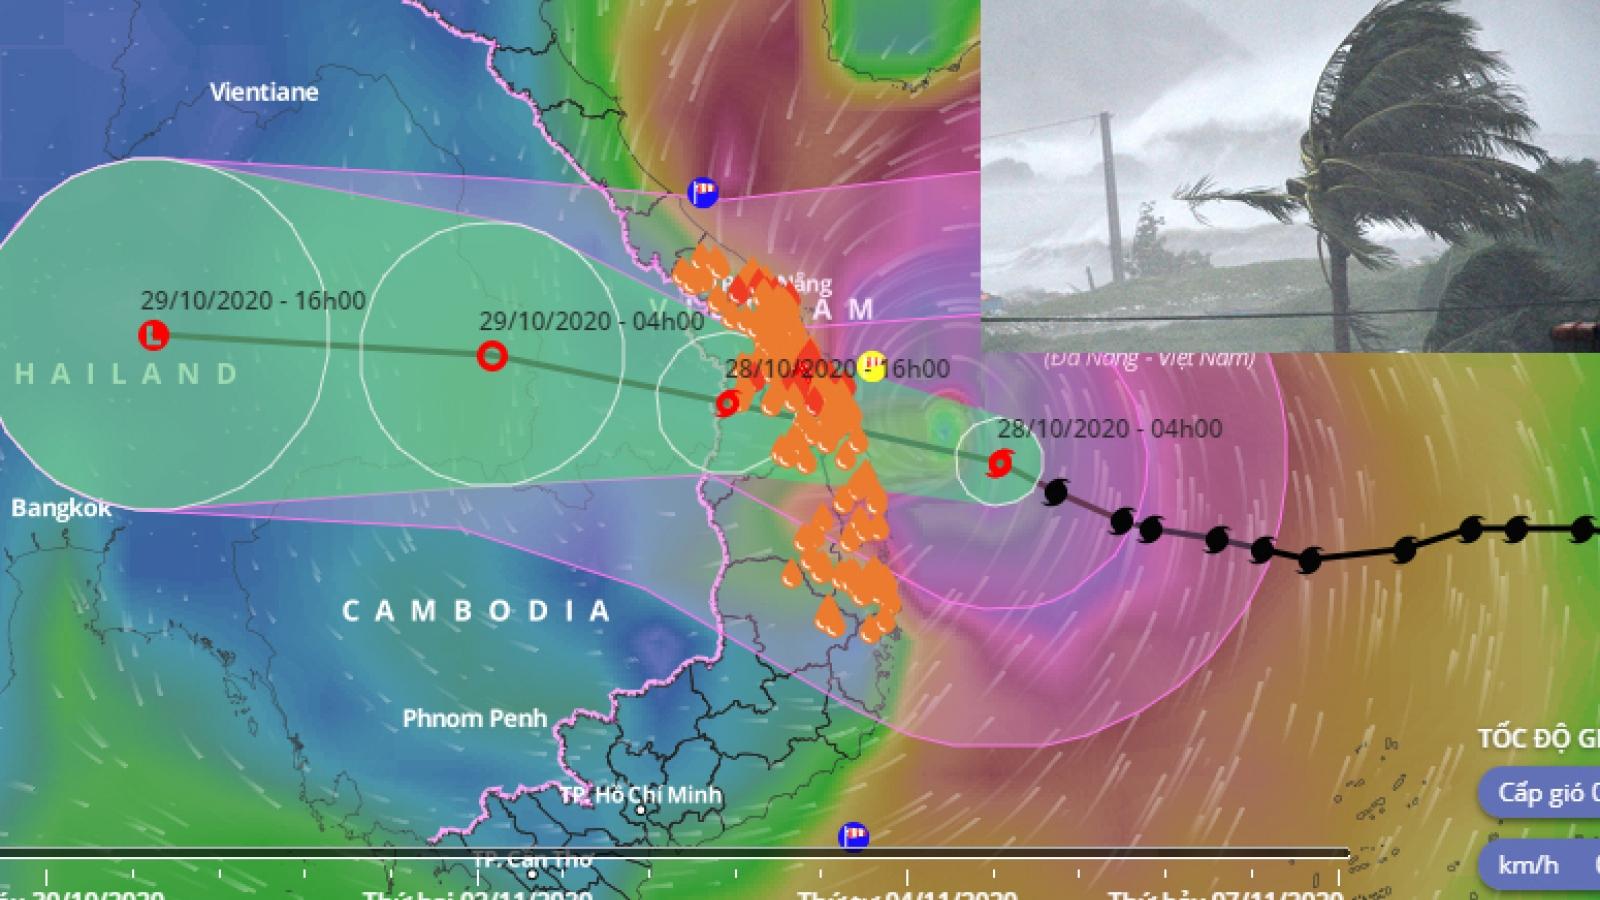 Typhoon Molave gathers steam, makes landfall Oct. 28